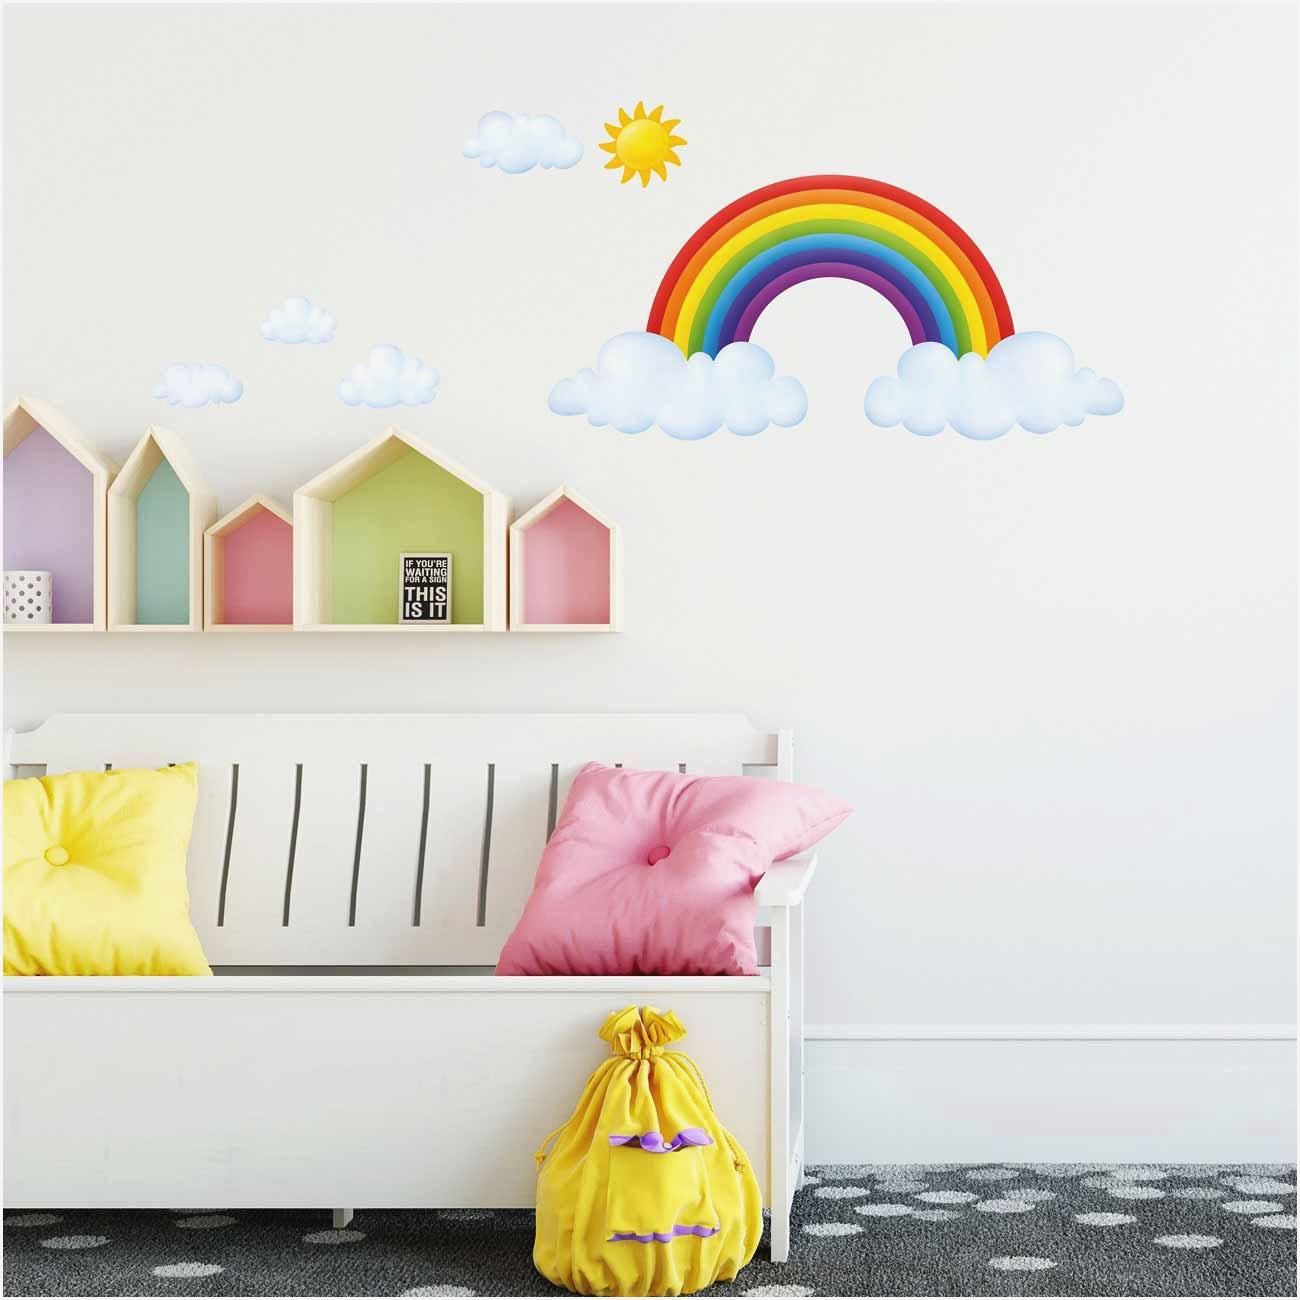 Full Size of Kinderzimmer Wanddeko Sonne Himmel Sterne Regale Regal Küche Sofa Weiß Kinderzimmer Kinderzimmer Wanddeko